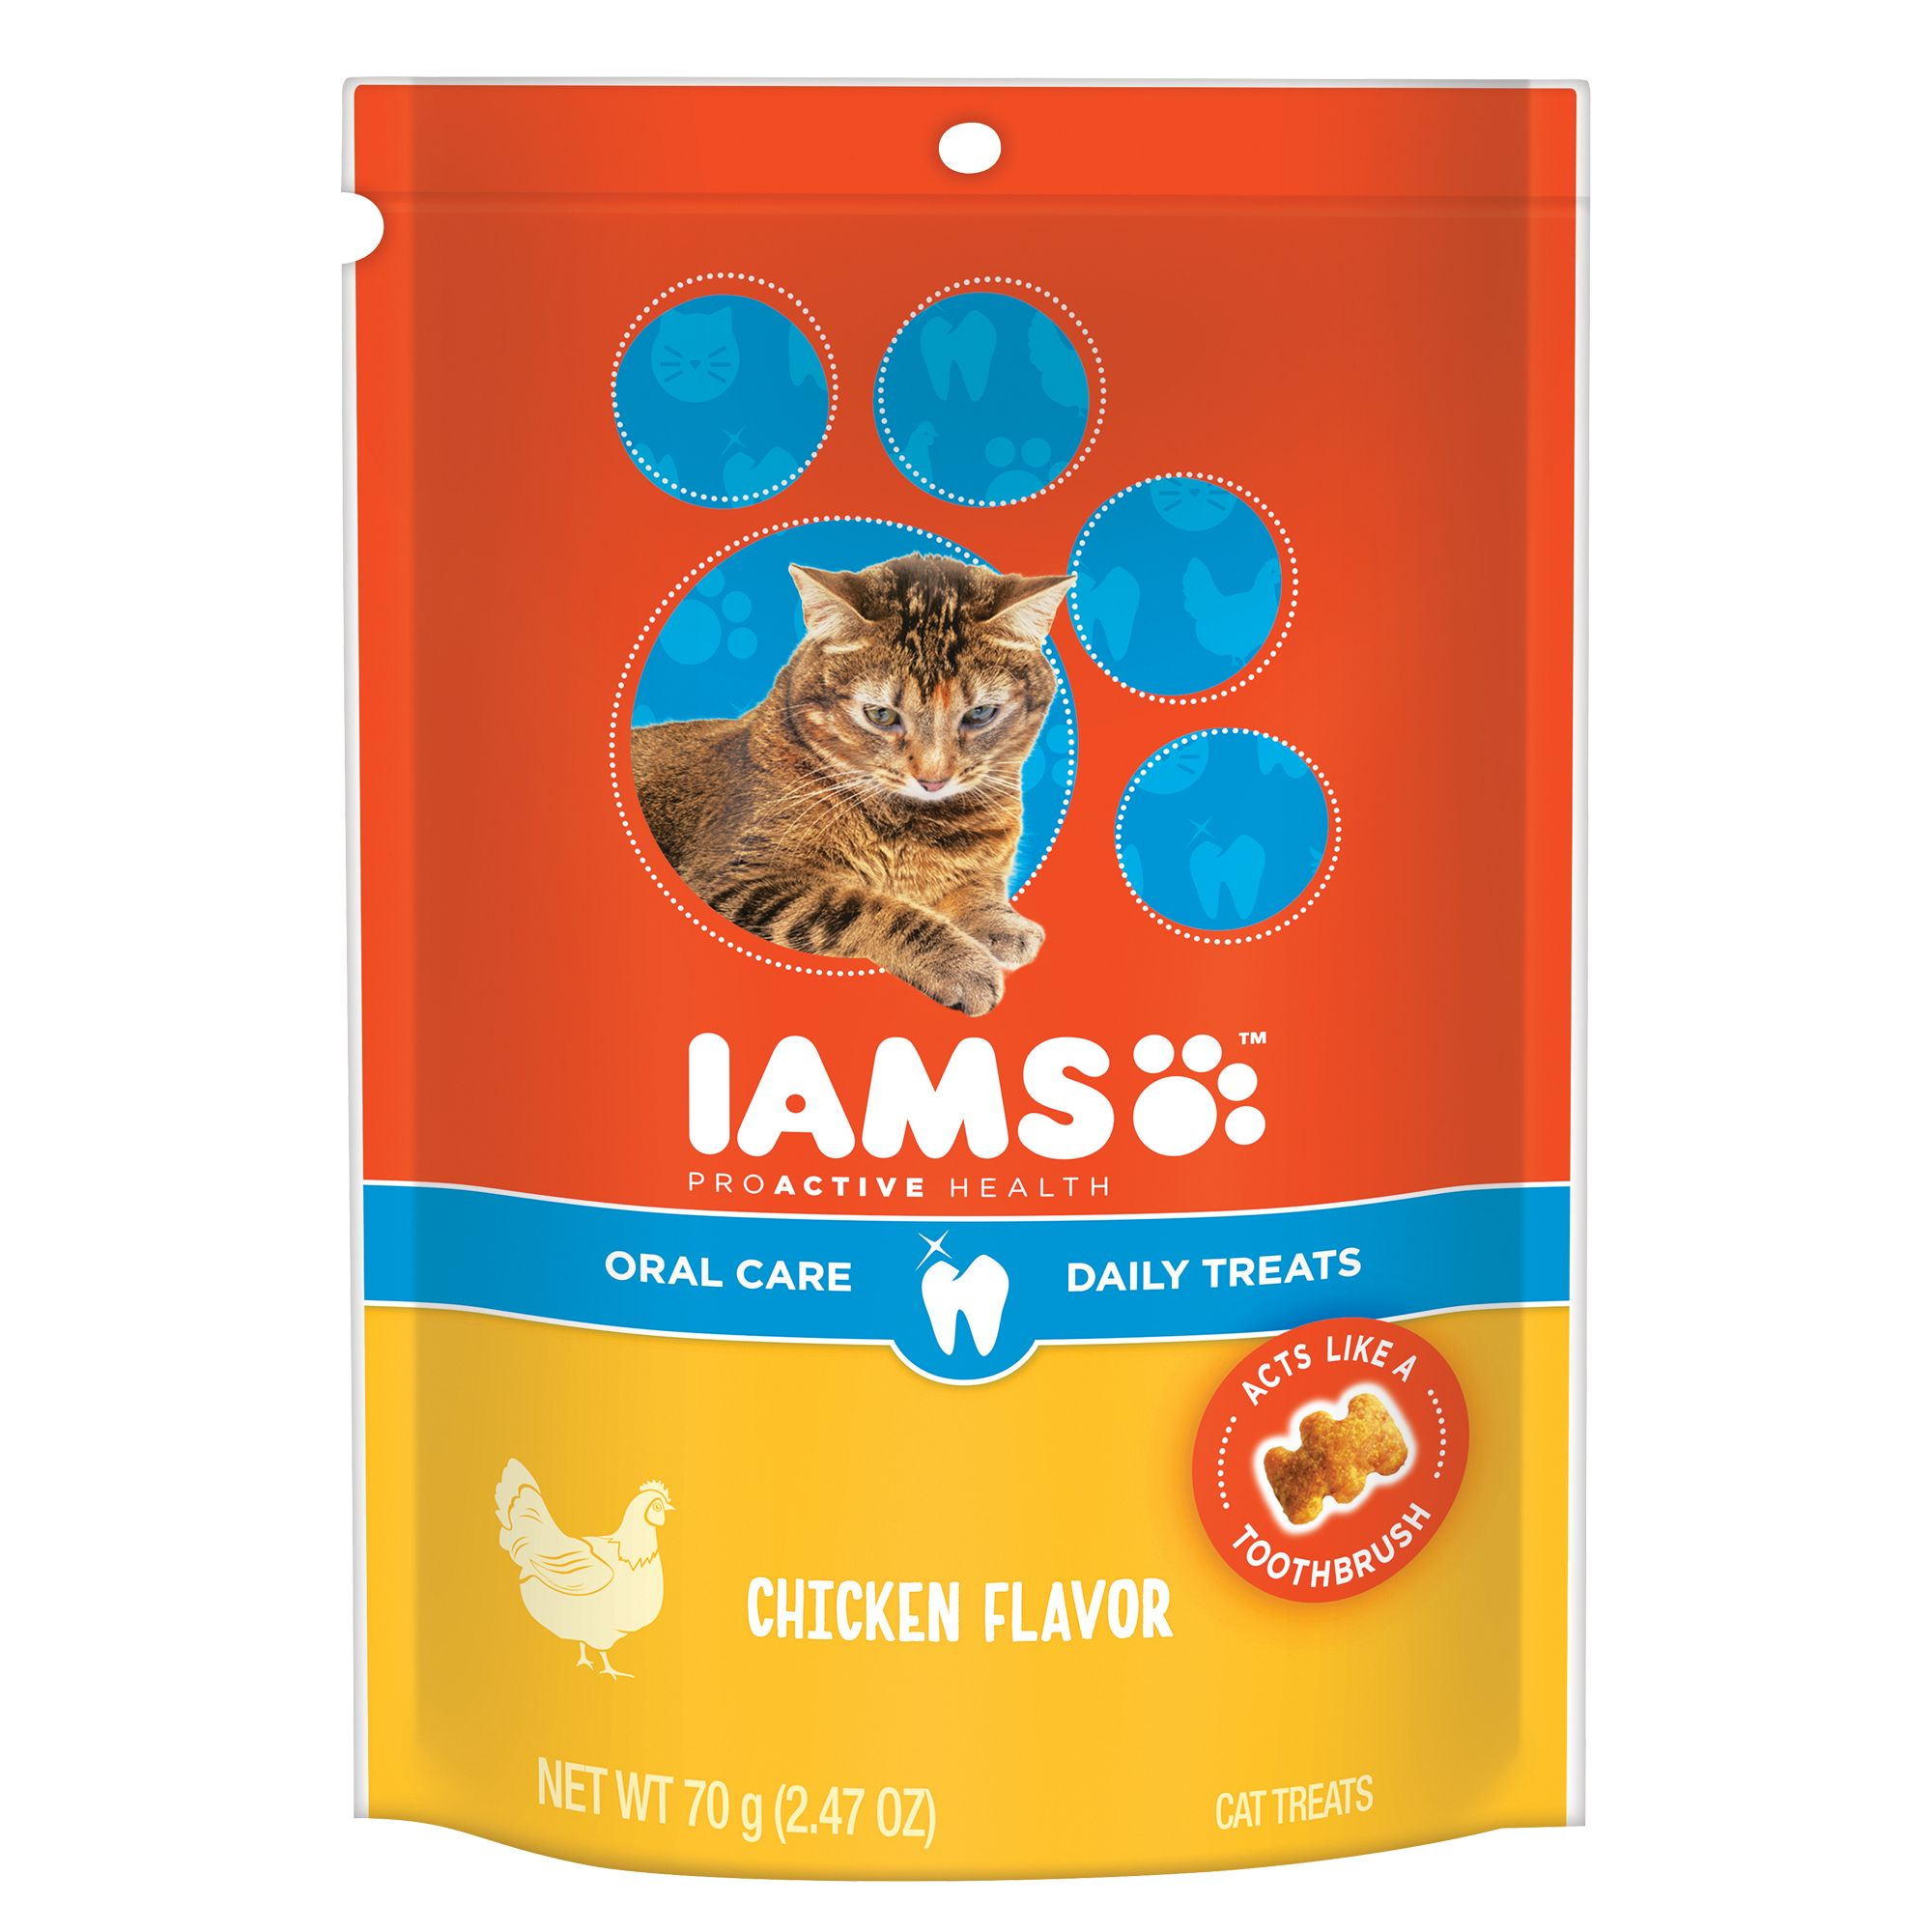 Iams Proactive Health Dental Cat Treat Chicken Size 2.47 Oz